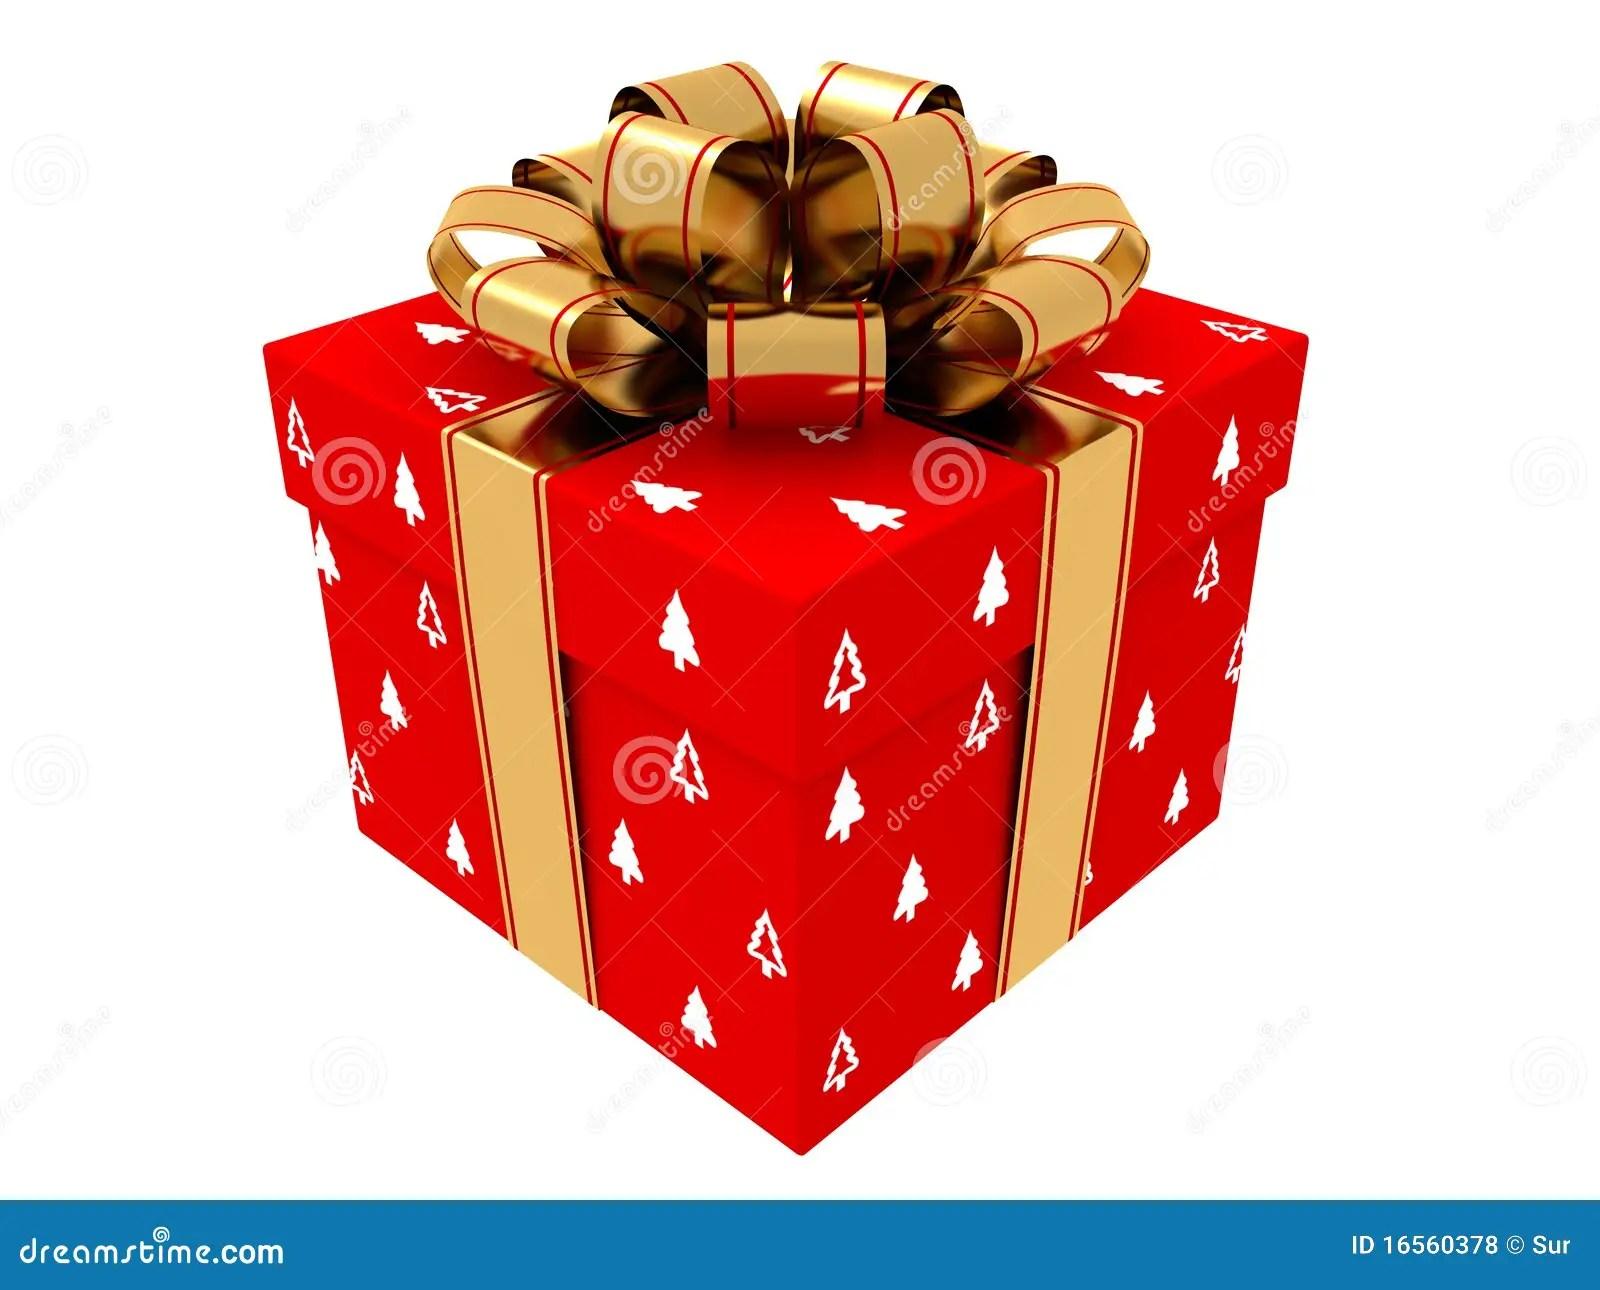 Christmas Gift Royalty Free Stock Photos Image 16560378